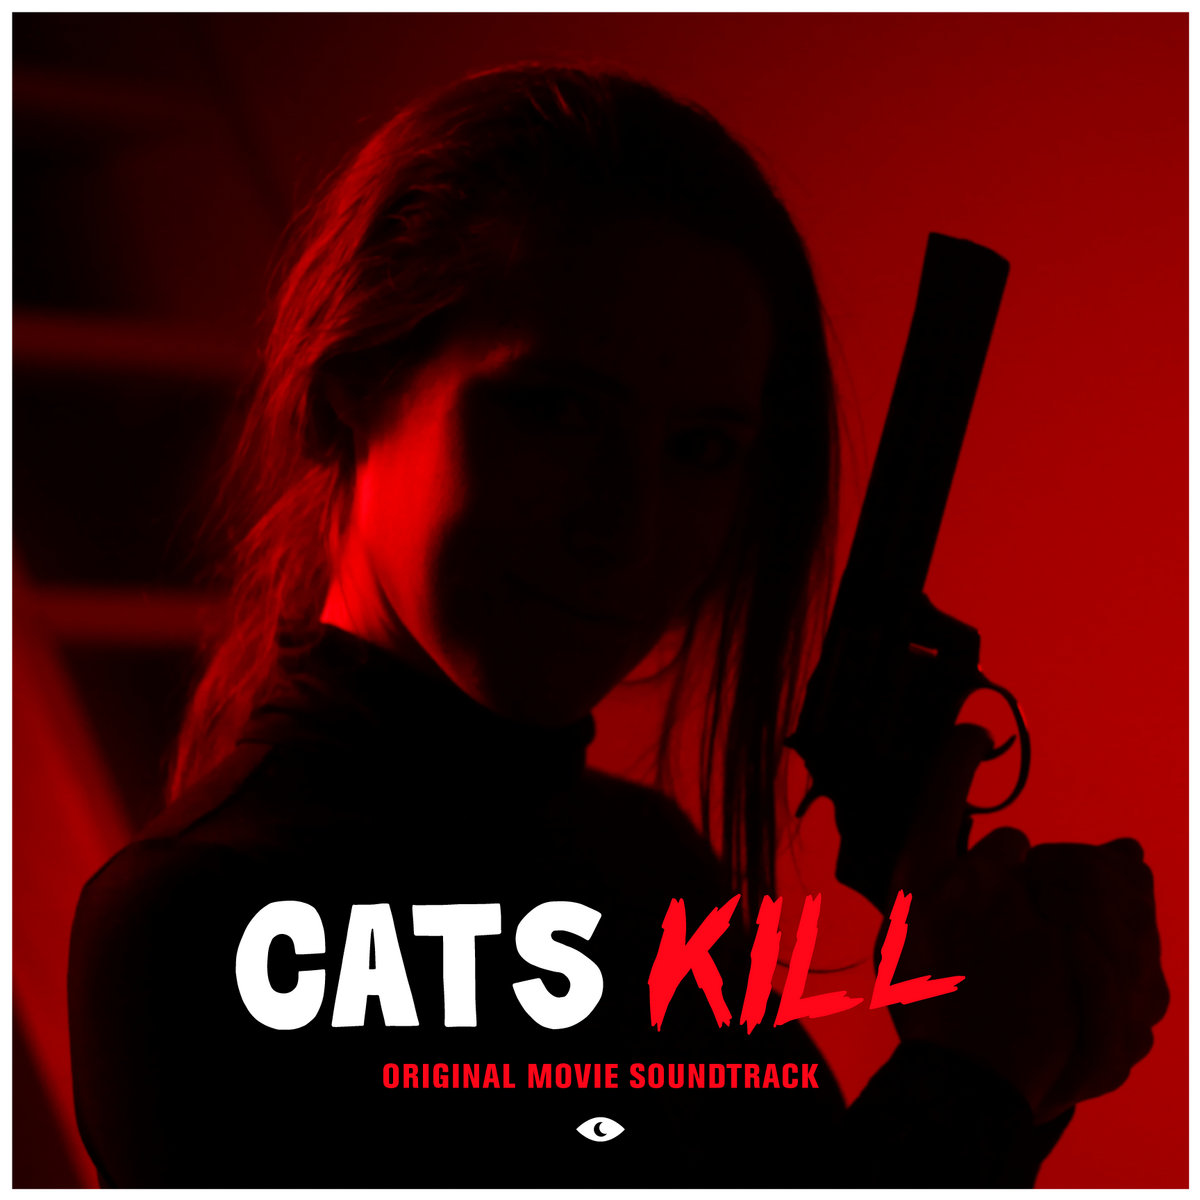 Kill a cat in a dream. Dream interpretation 86